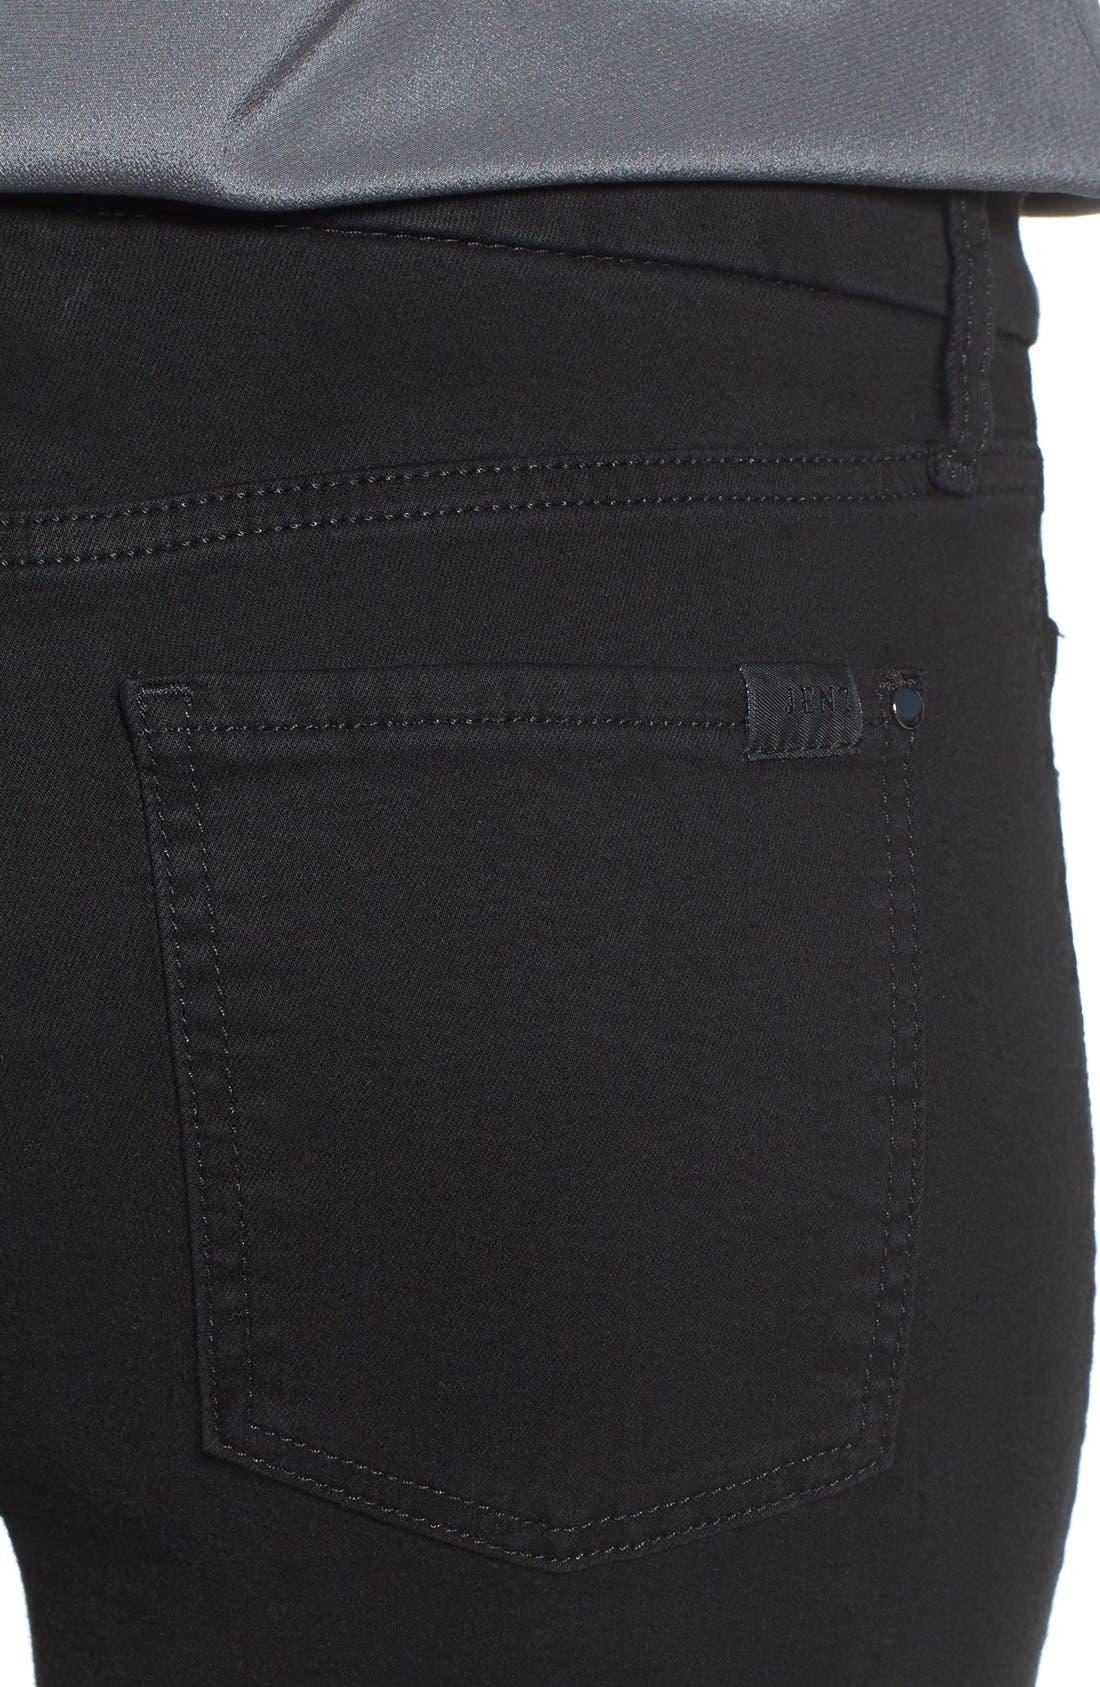 Tuxedo Stripe Skinny Jeans,                             Alternate thumbnail 4, color,                             004